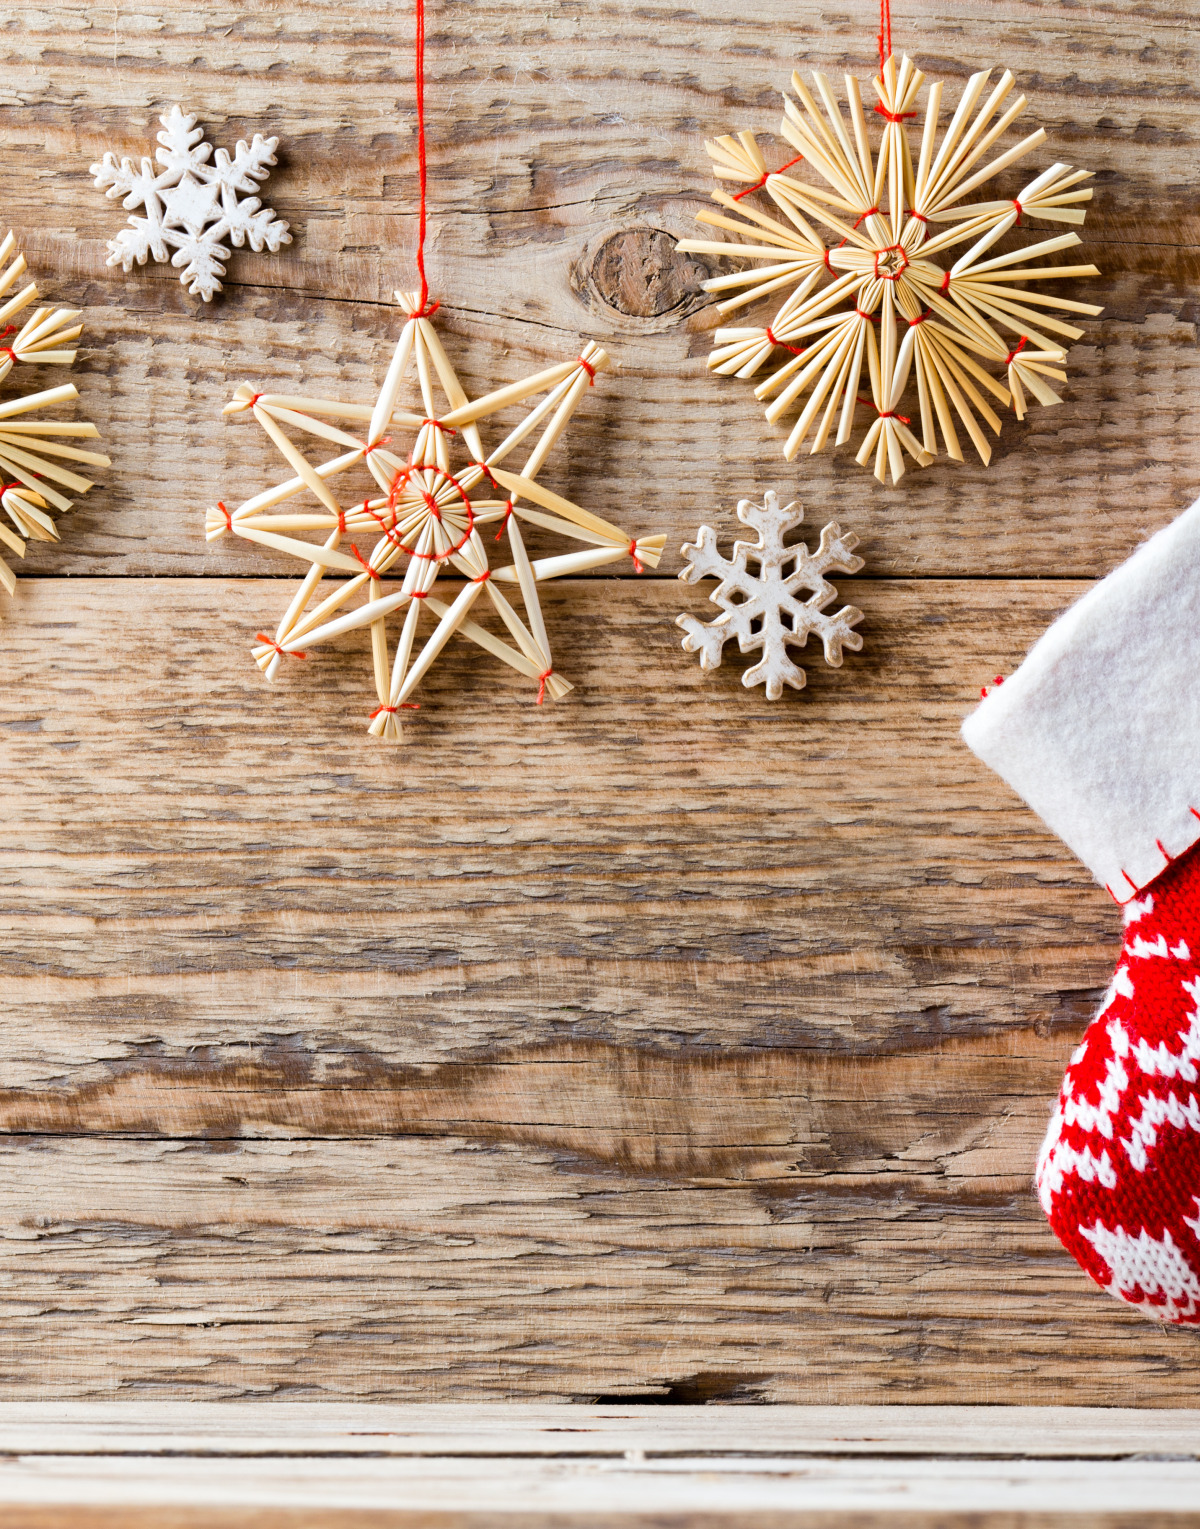 merry christmas nexus decorations - photo #2